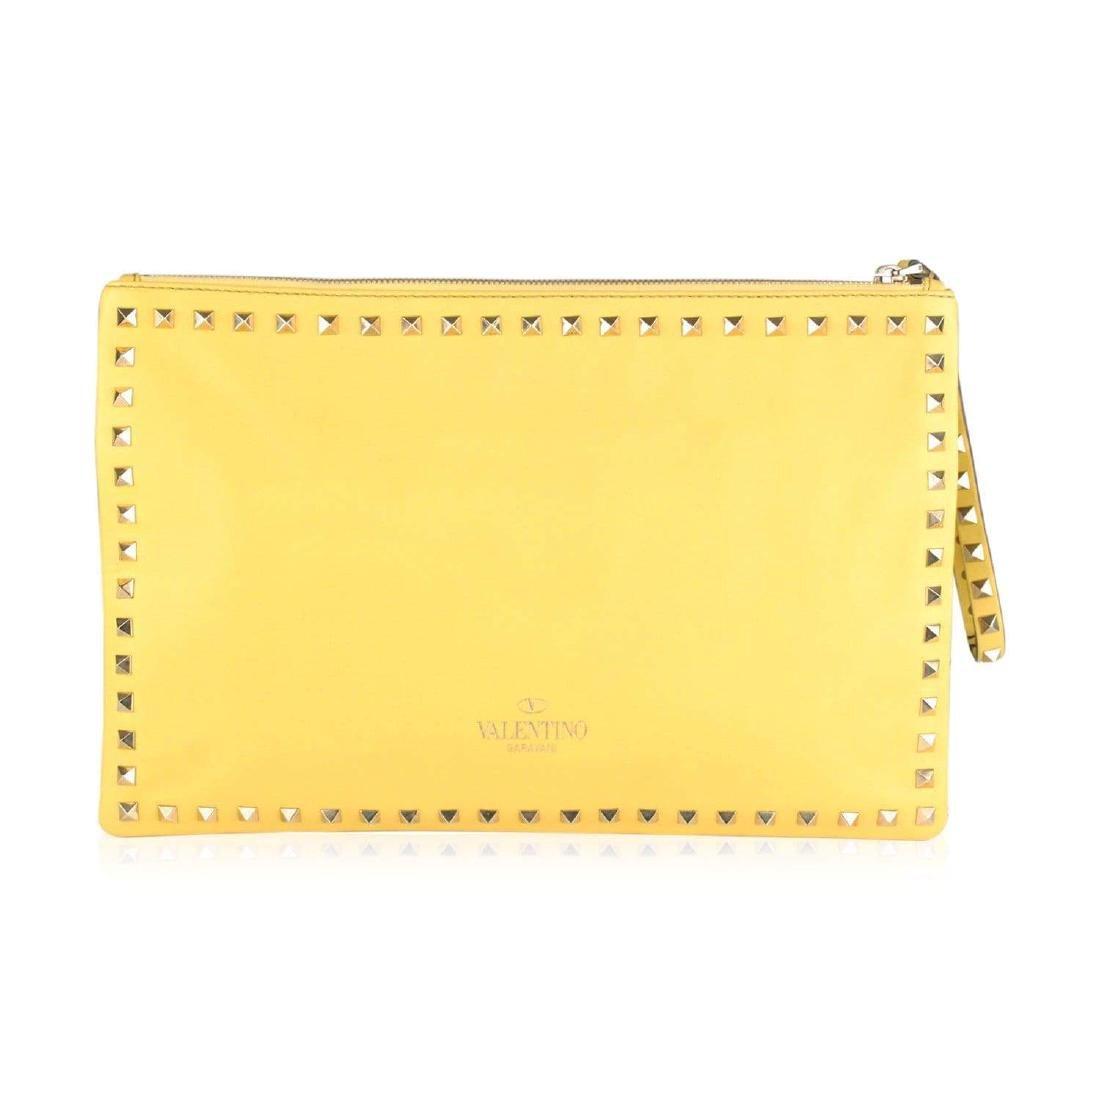 Valentino Rockstud Large Clutch Wrist Bag